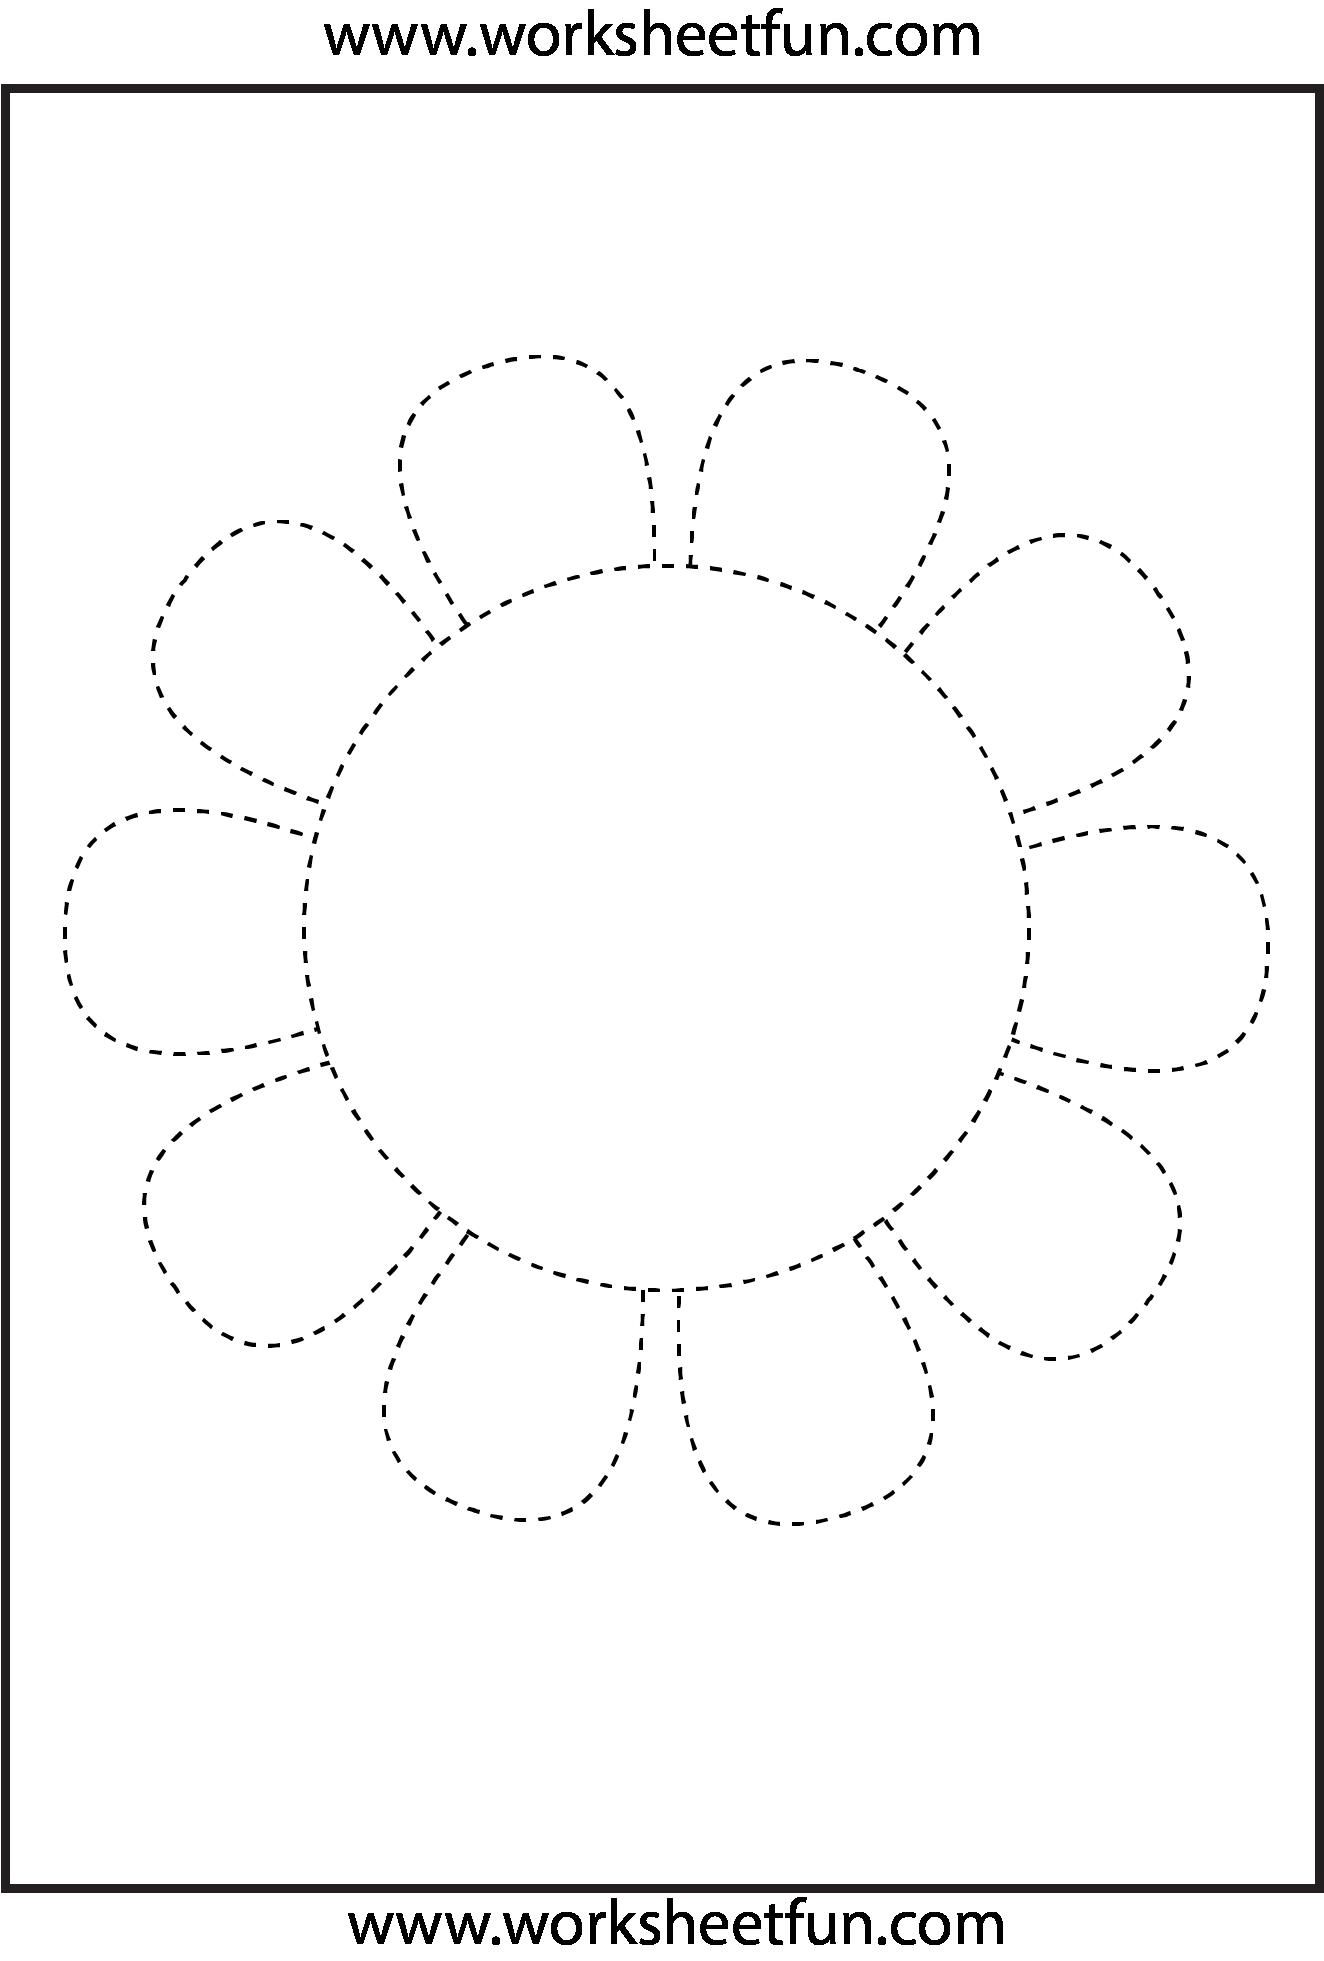 Picture Tracing 1 Worksheet Fichas De Trabalho Ideias Para A Sala De Aula Desenhos Pontilhados [ 1961 x 1324 Pixel ]